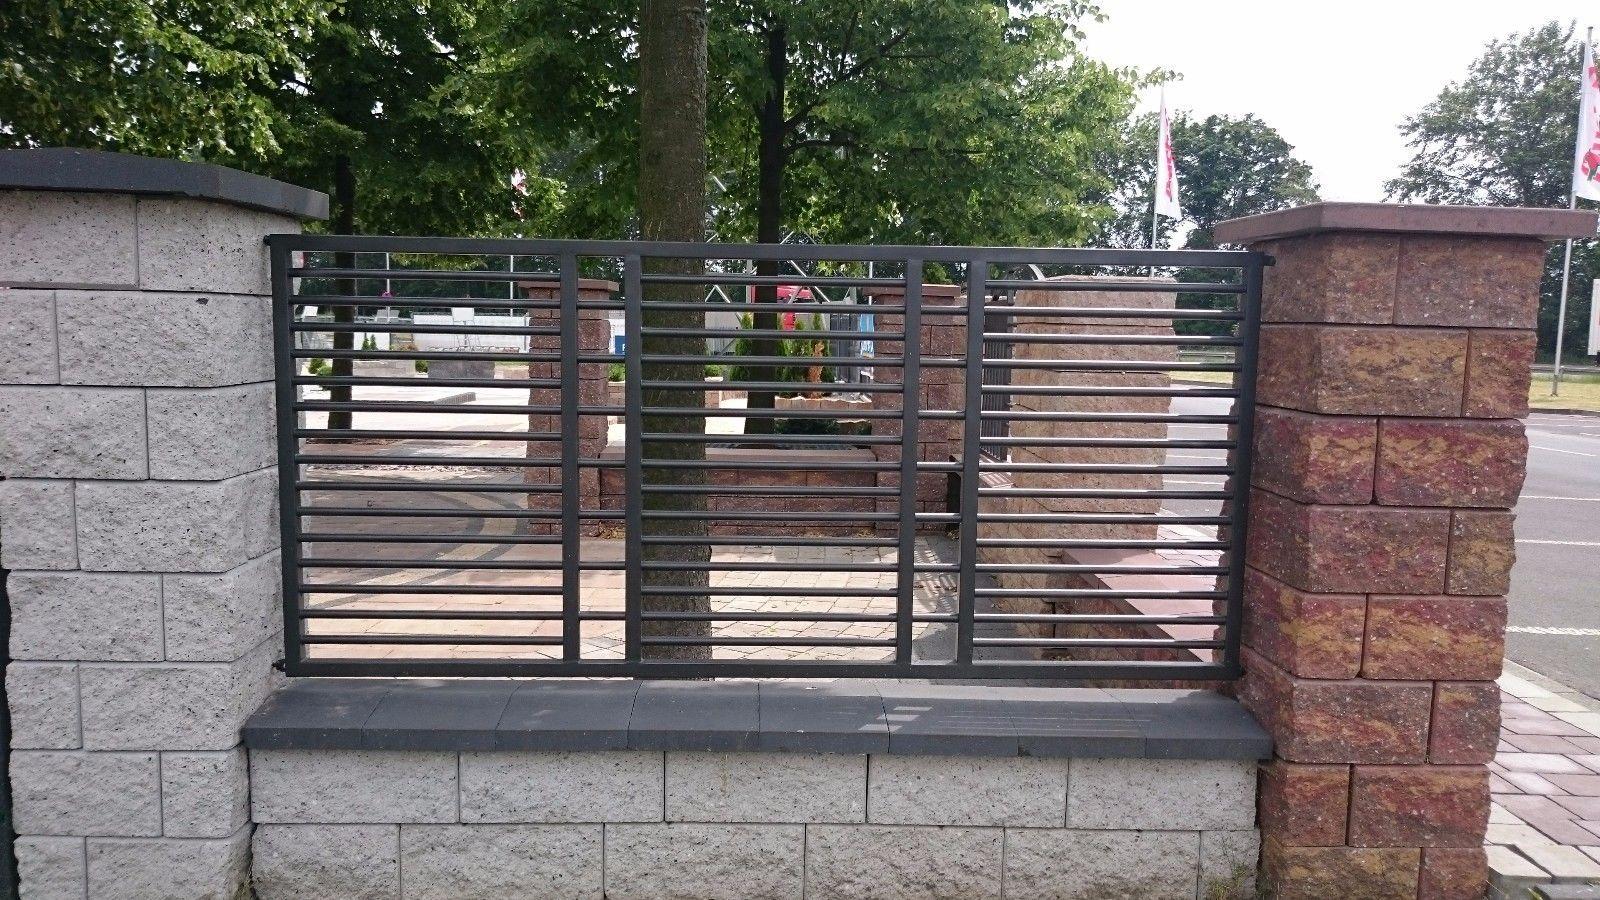 Recinzione Giardino In Ferro modern wrought iron railings fence panel metal balustrade